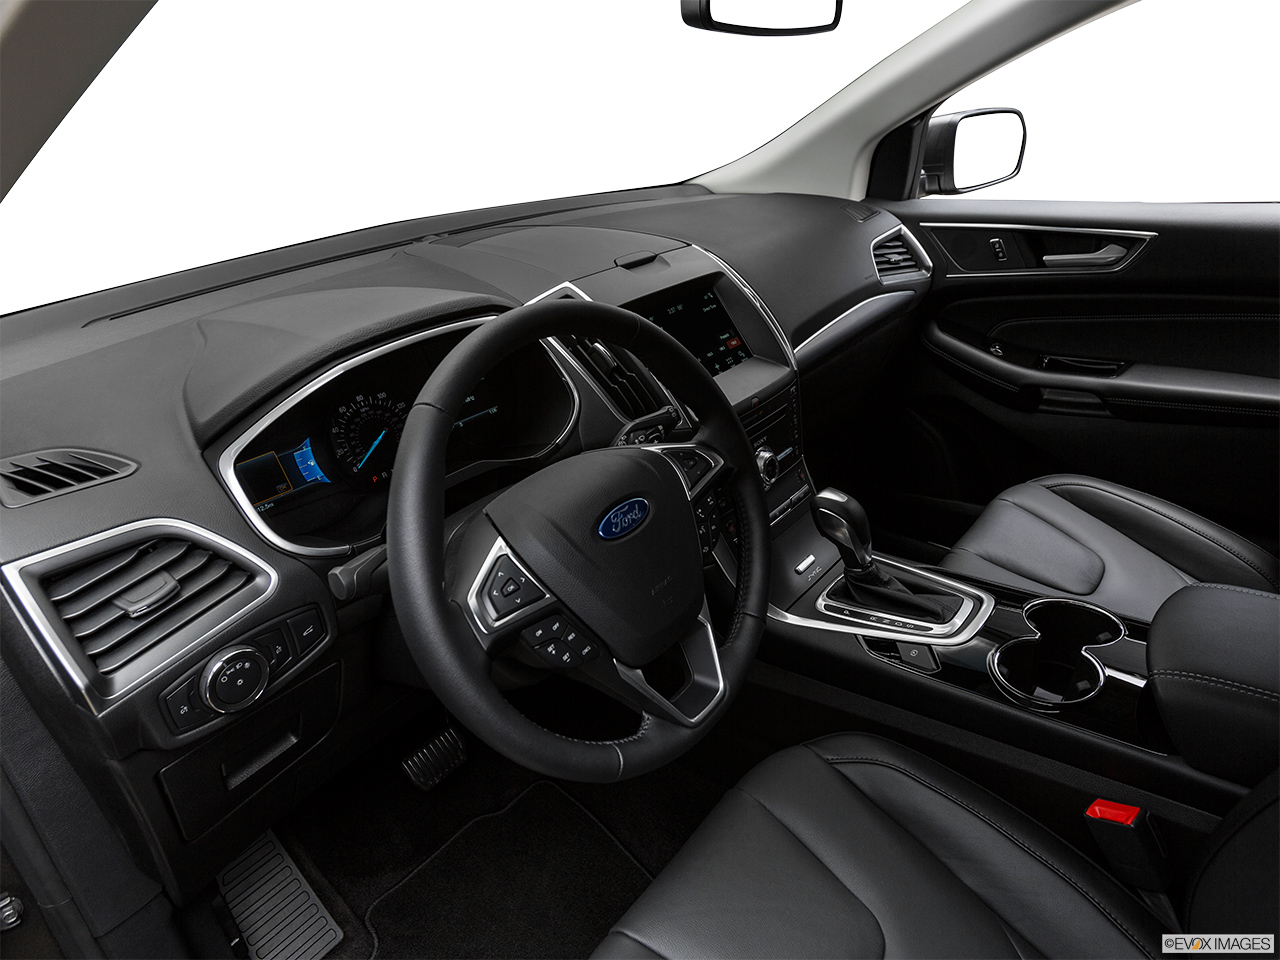 2017 Gmc Yukon Denali >> Ford Edge 2017 3.5L V6 Titanium AWD Full Option in UAE: New Car Prices, Specs, Reviews & Photos ...